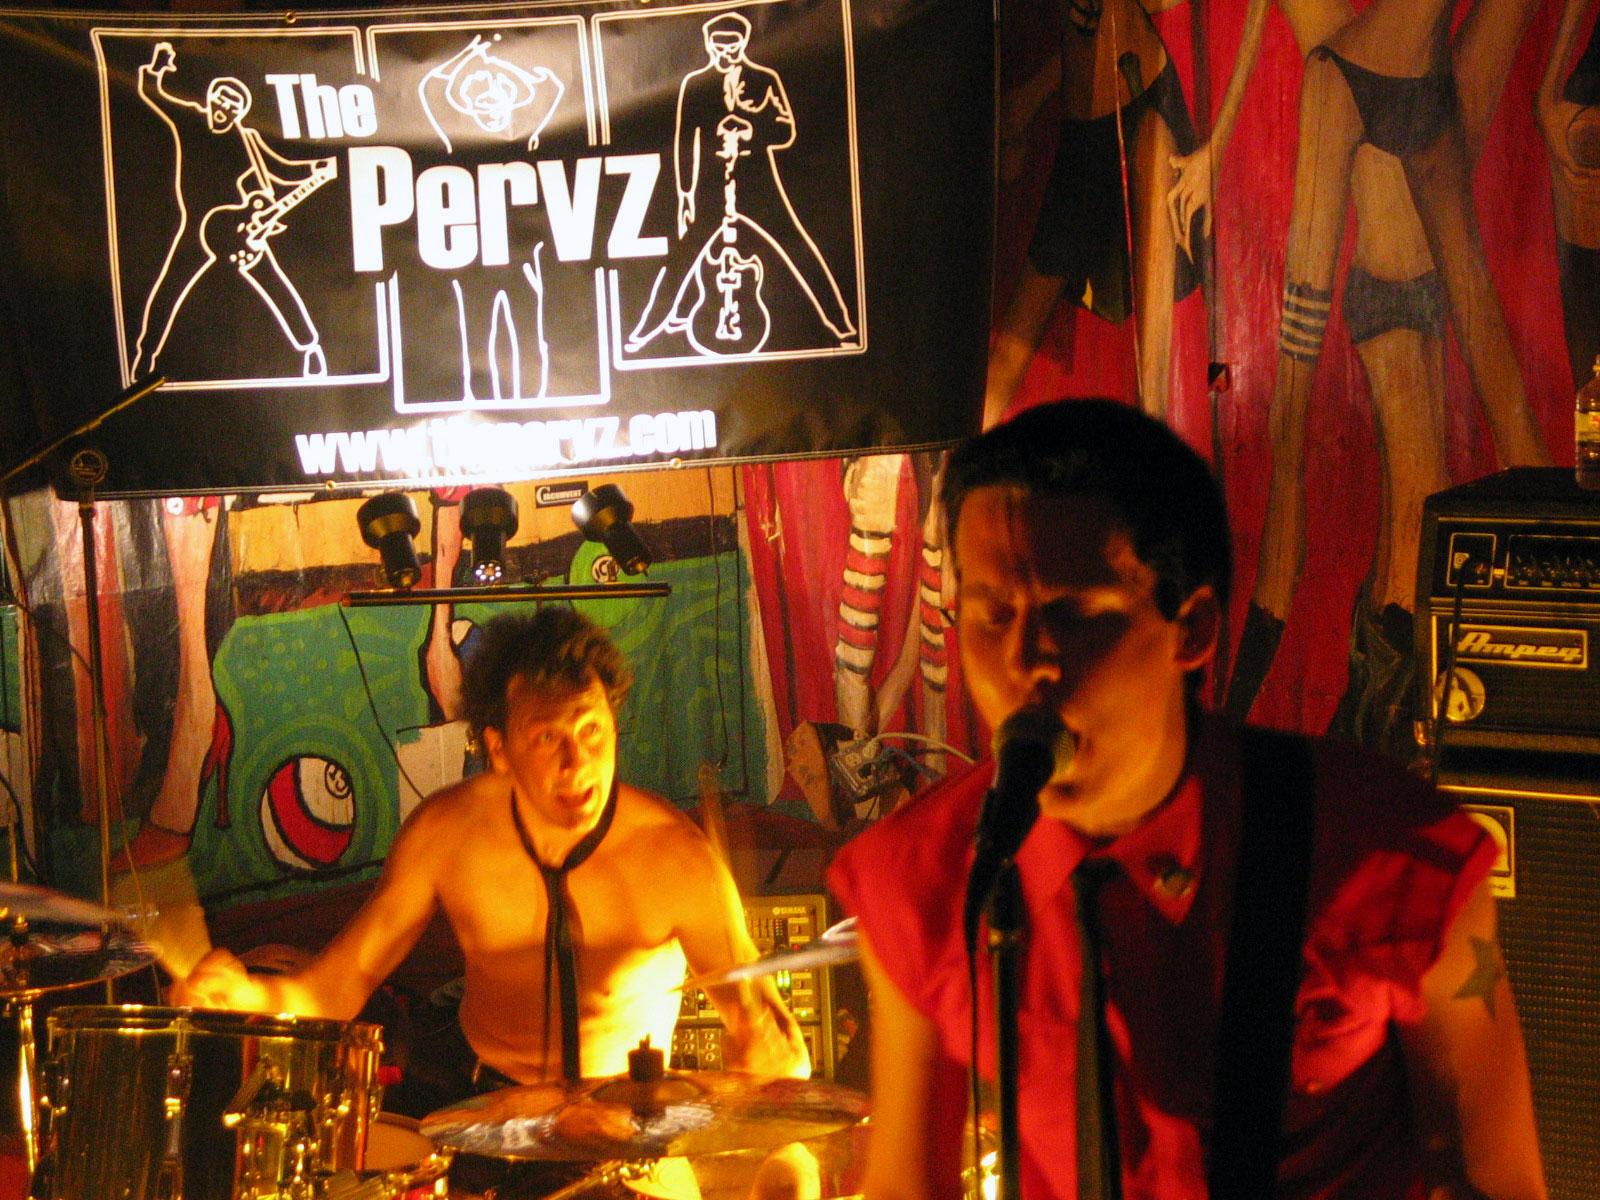 The Pervz. Kuva: Miika Mattila